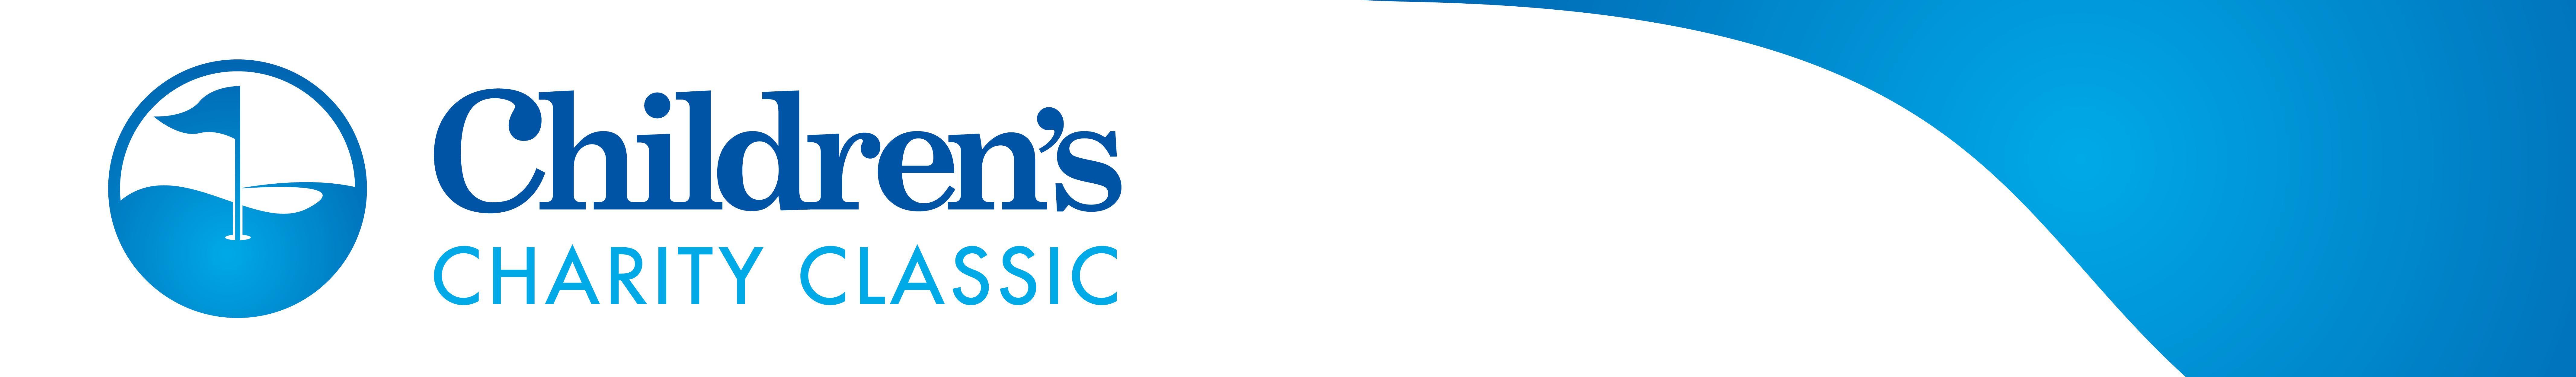 Charity Classic web header